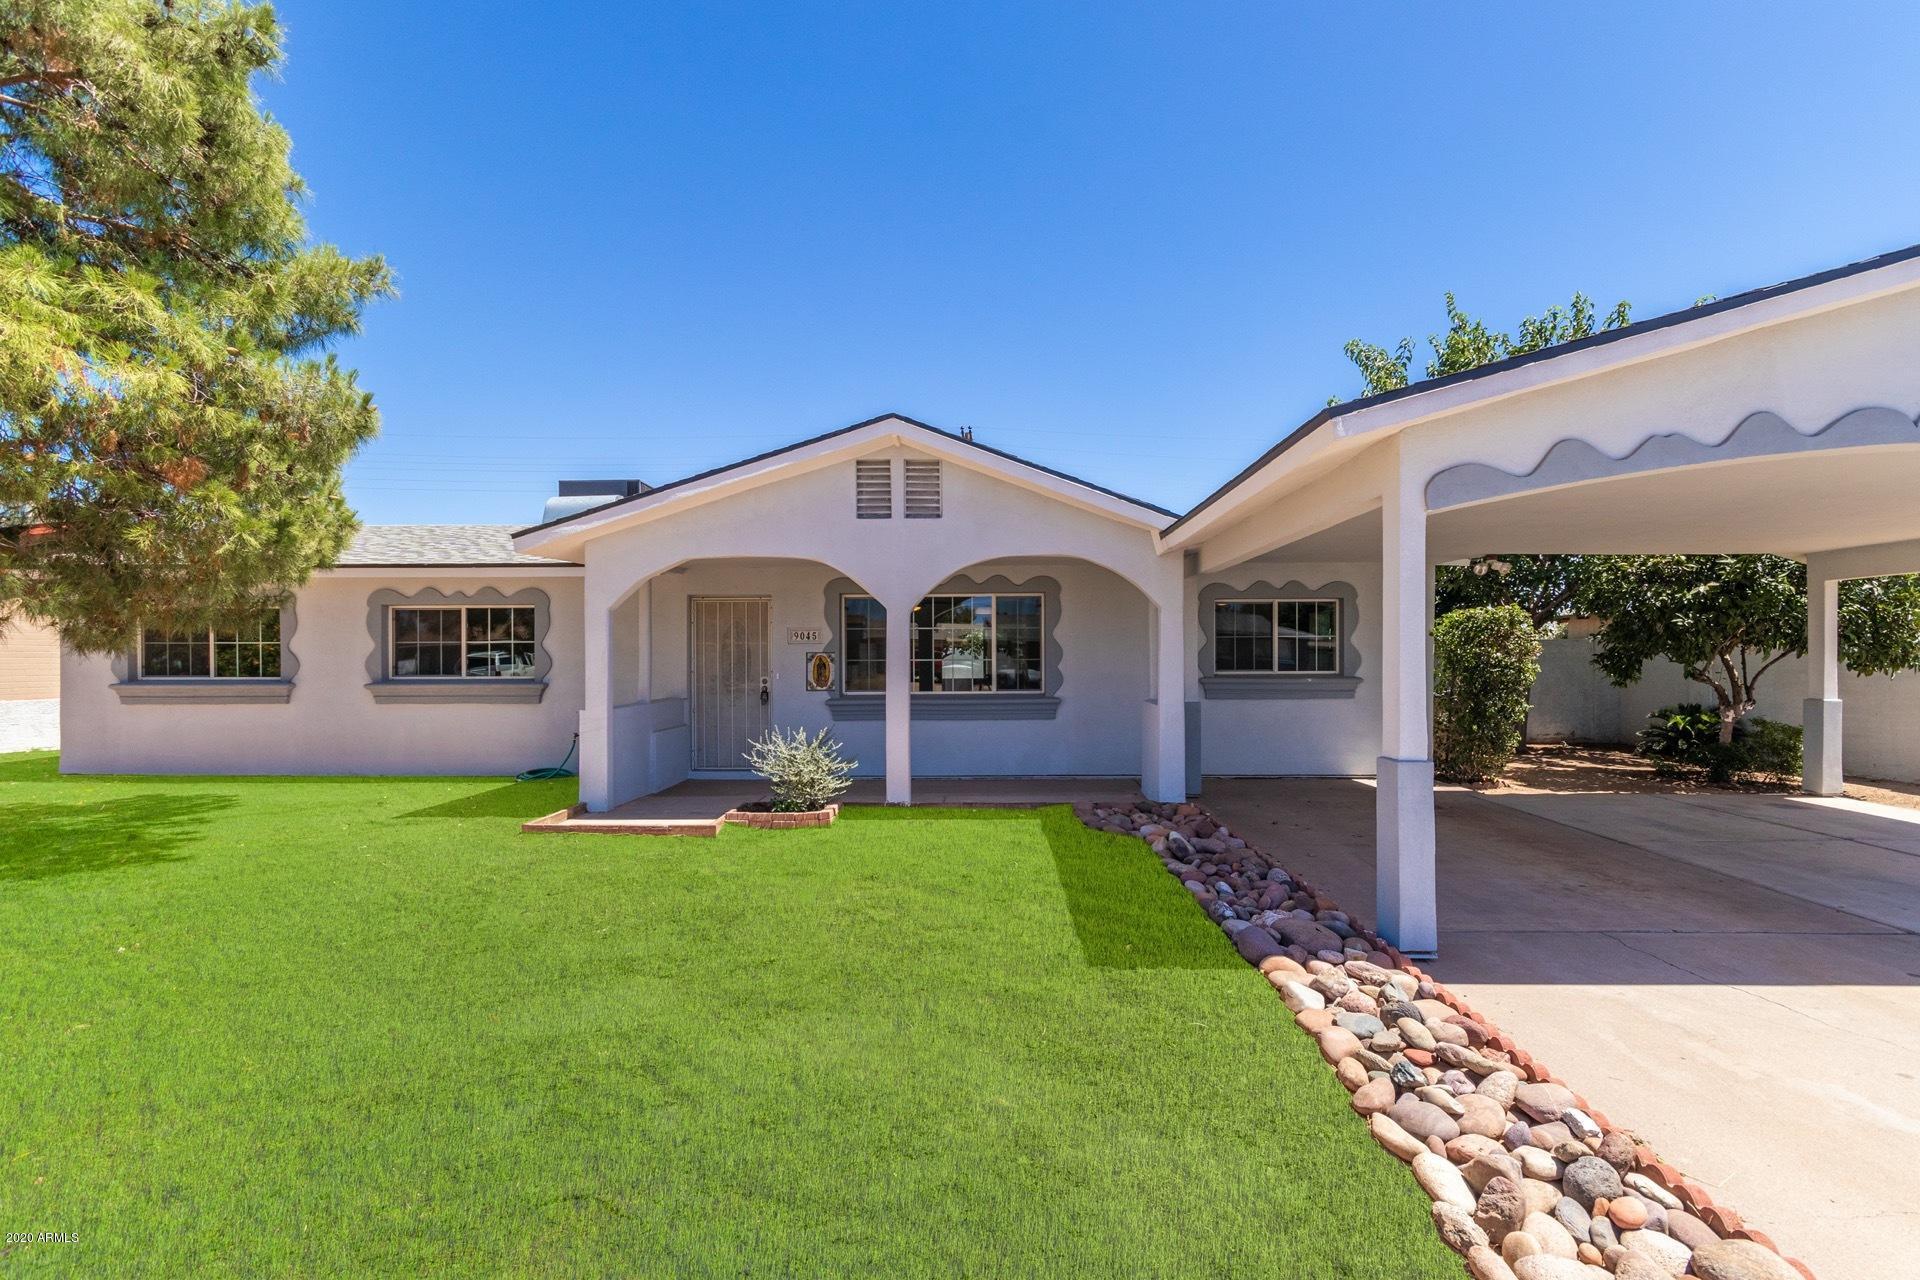 Photo of 9045 E MARGUERITE Avenue, Mesa, AZ 85208